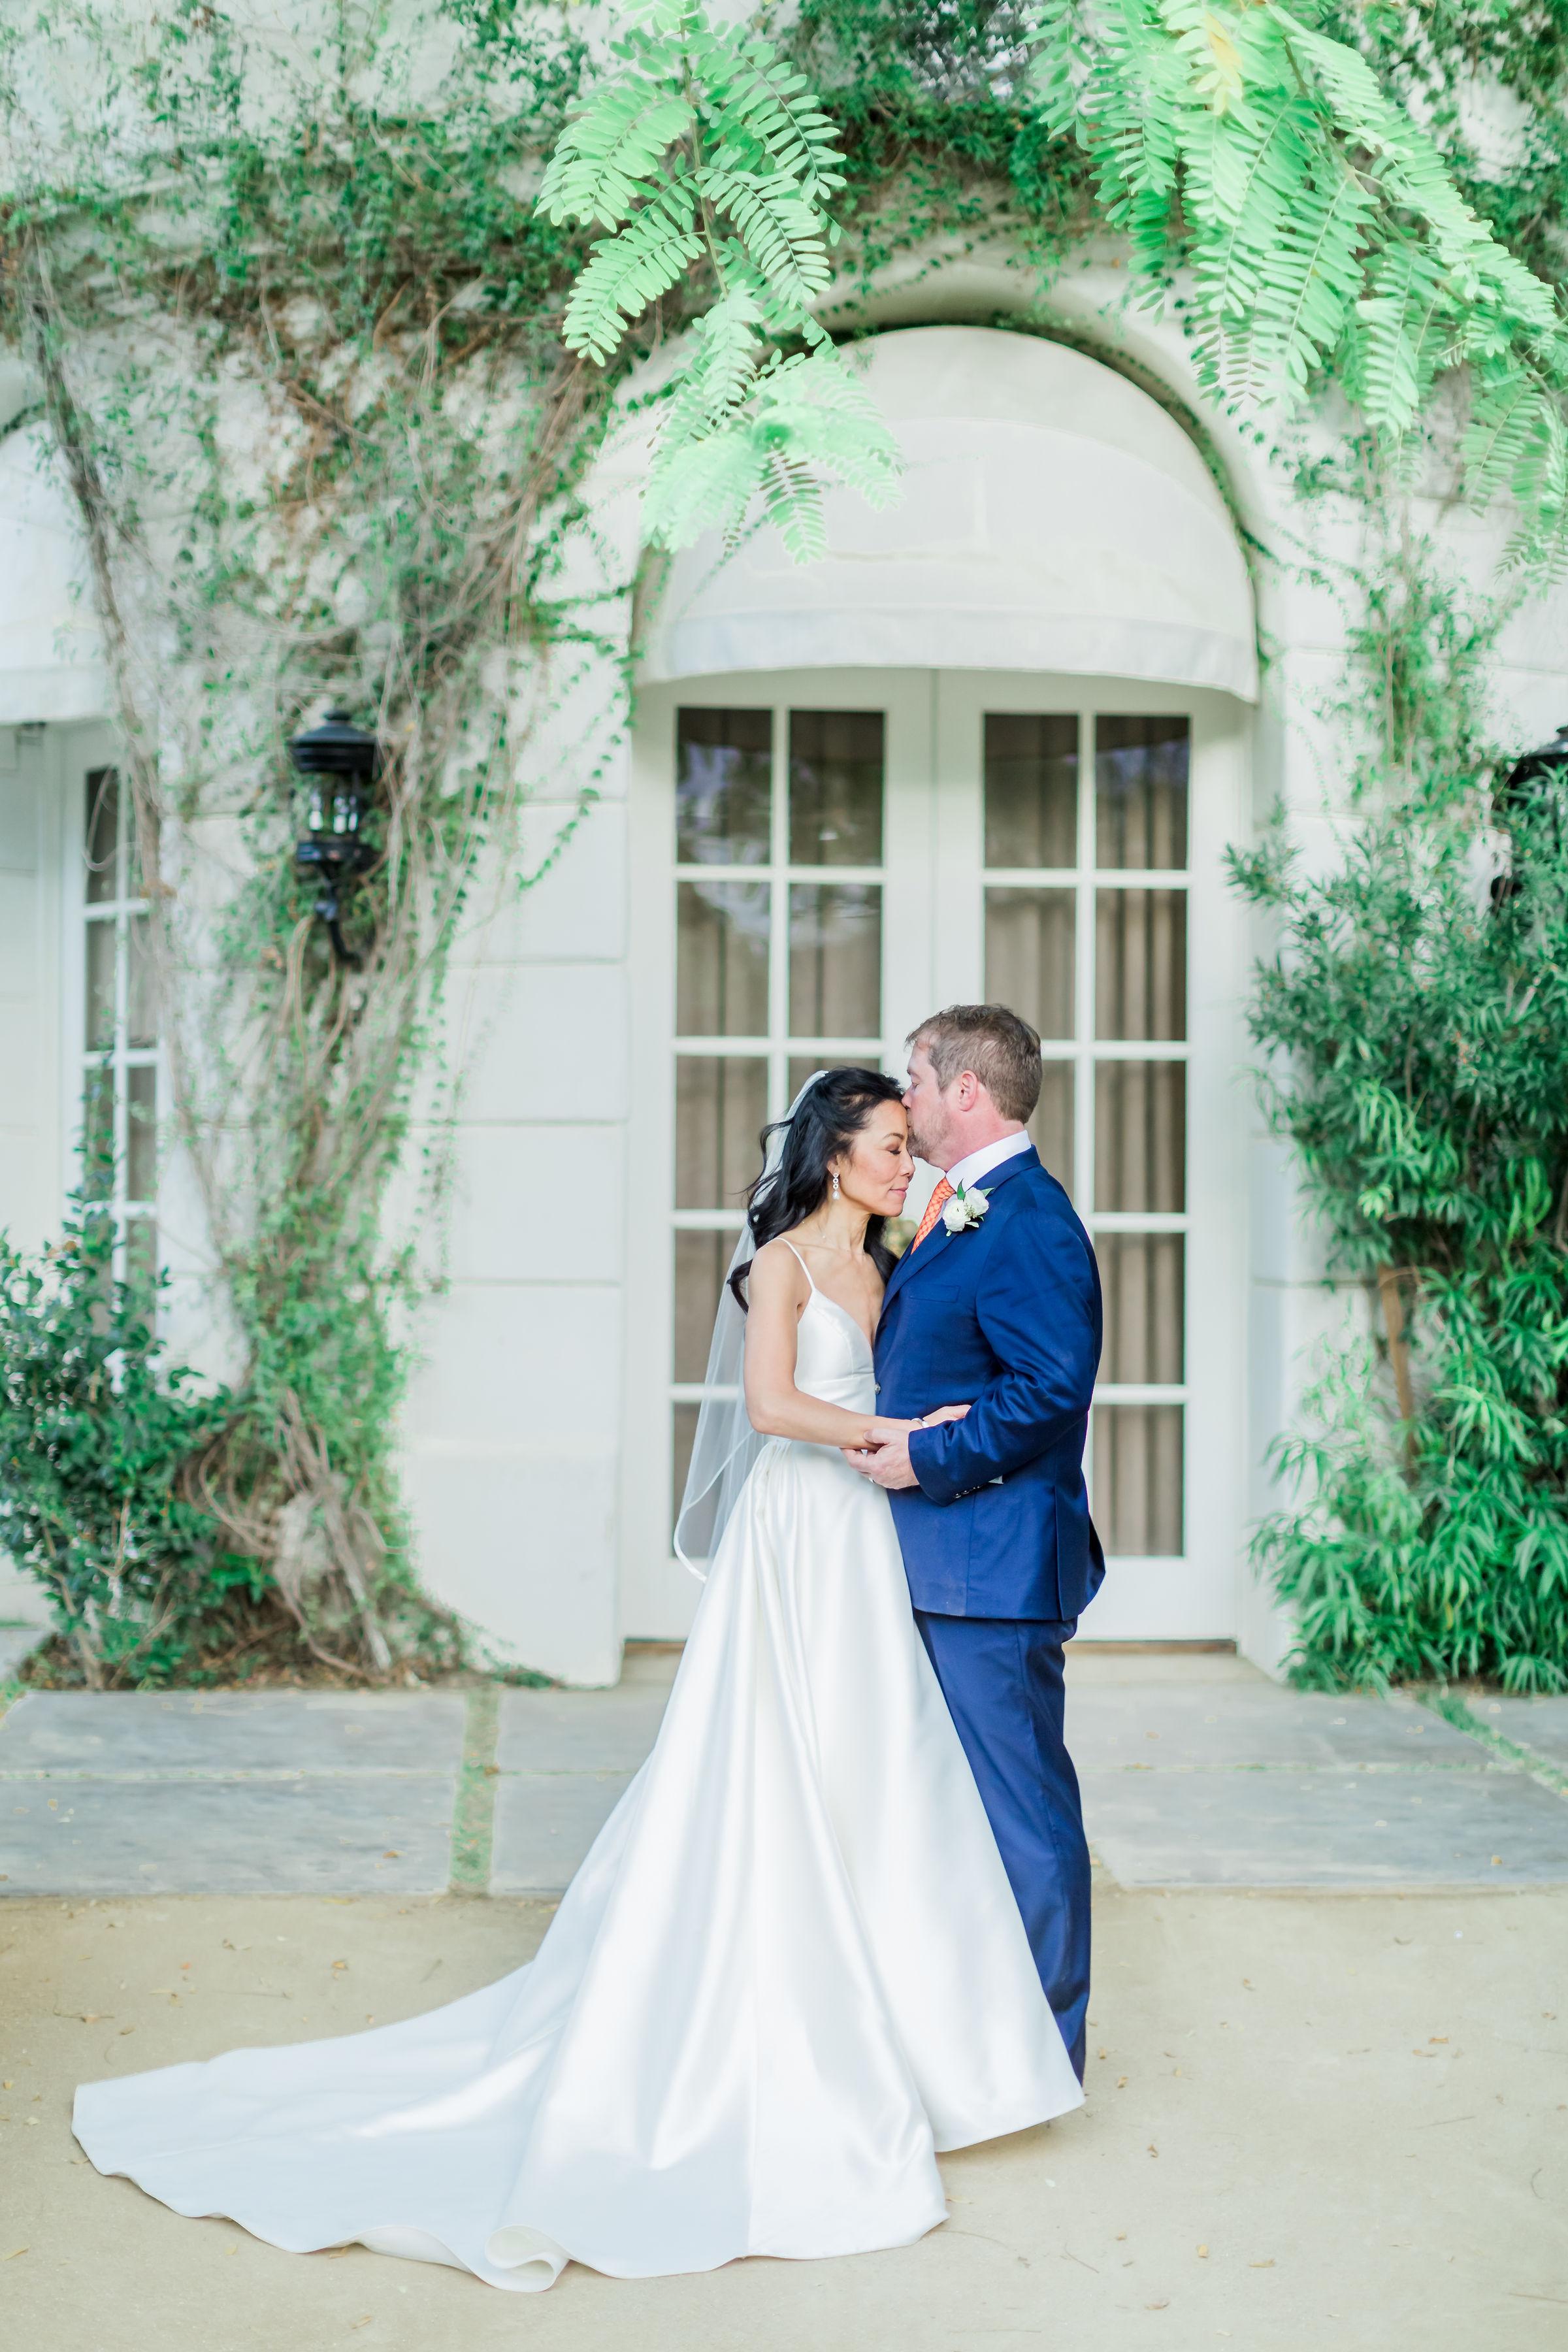 thao.chris.wedding.parker.palm.springs-673.jpg